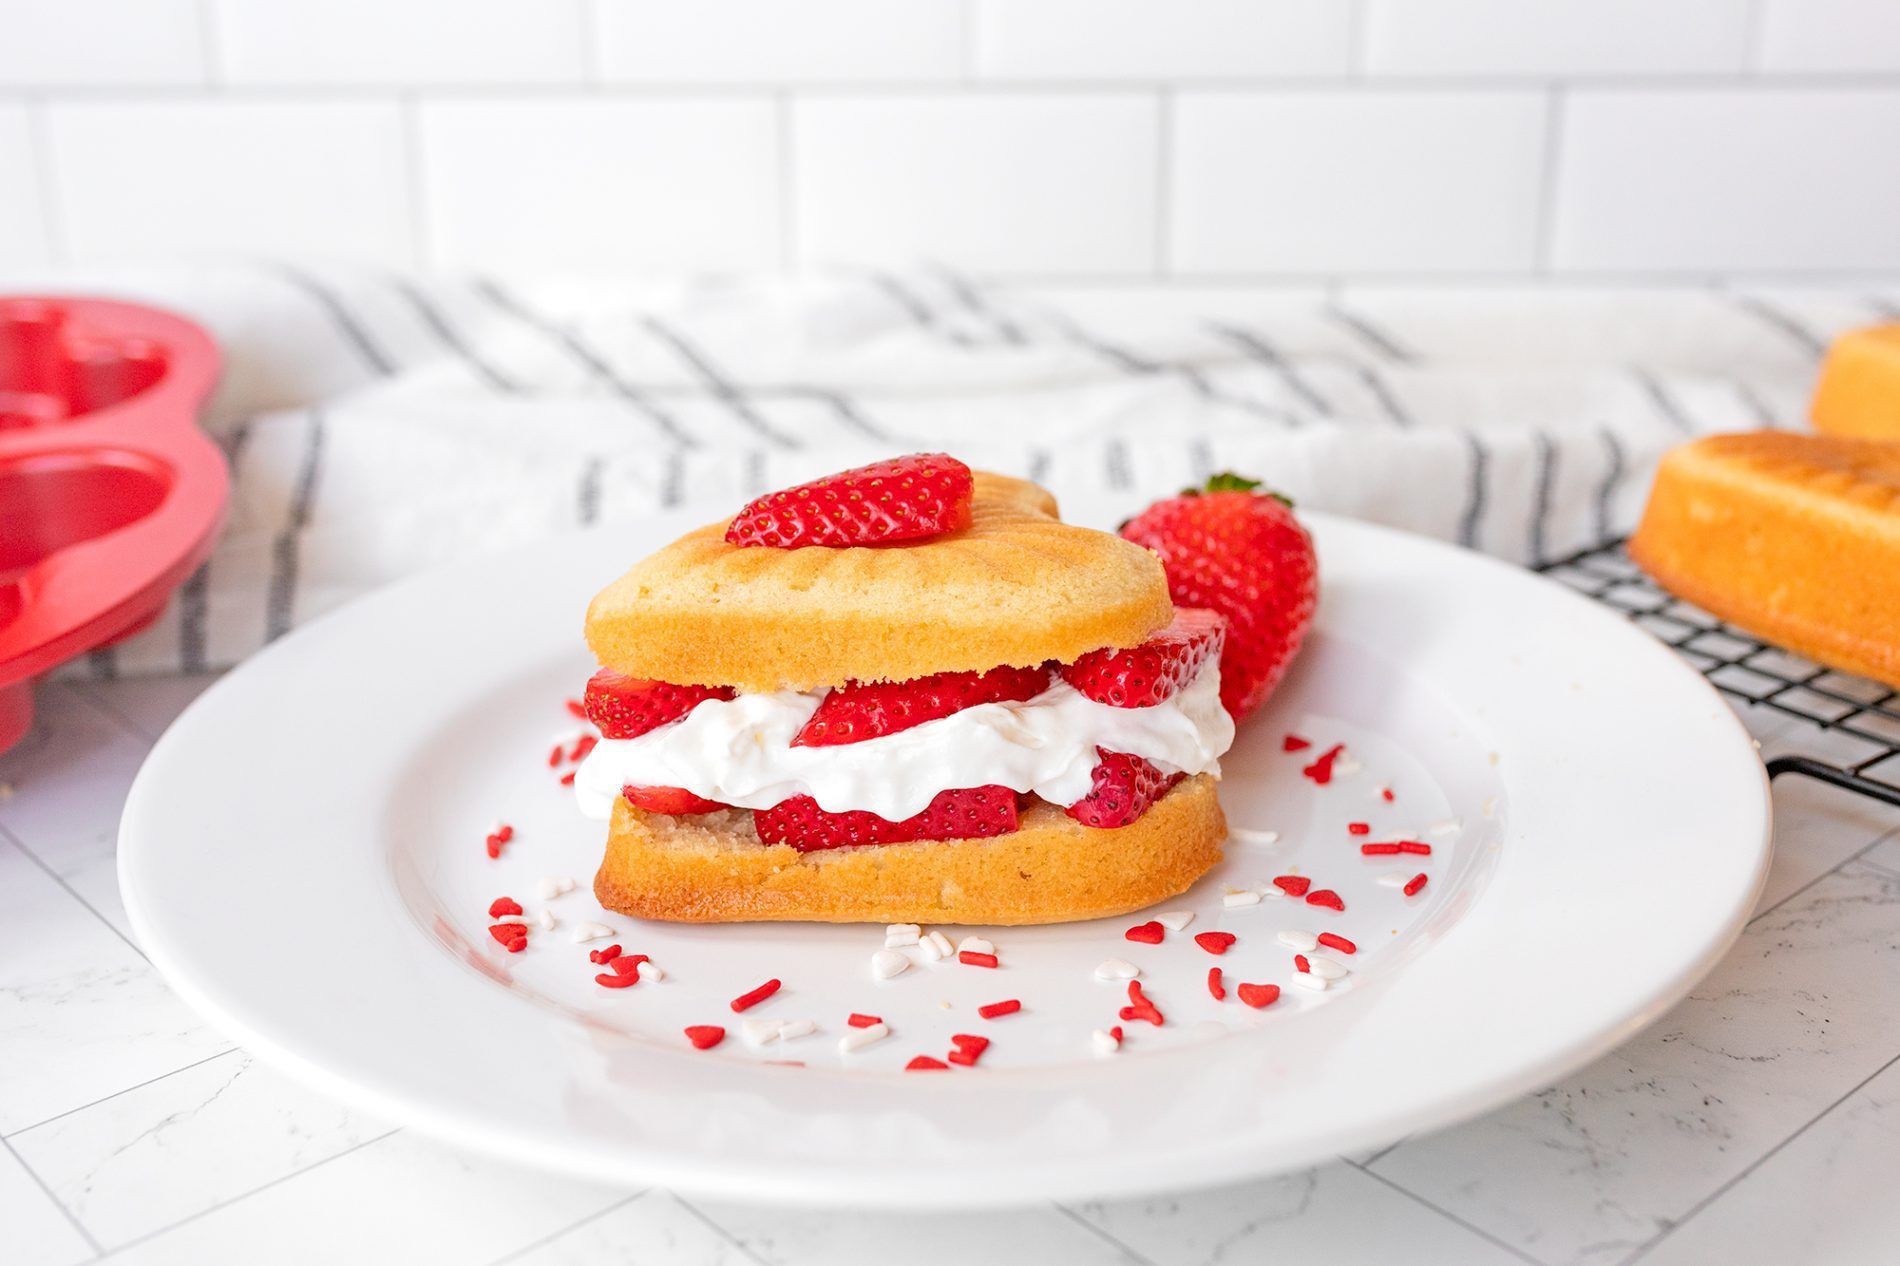 heart shaped strawberry shortcake on a plate